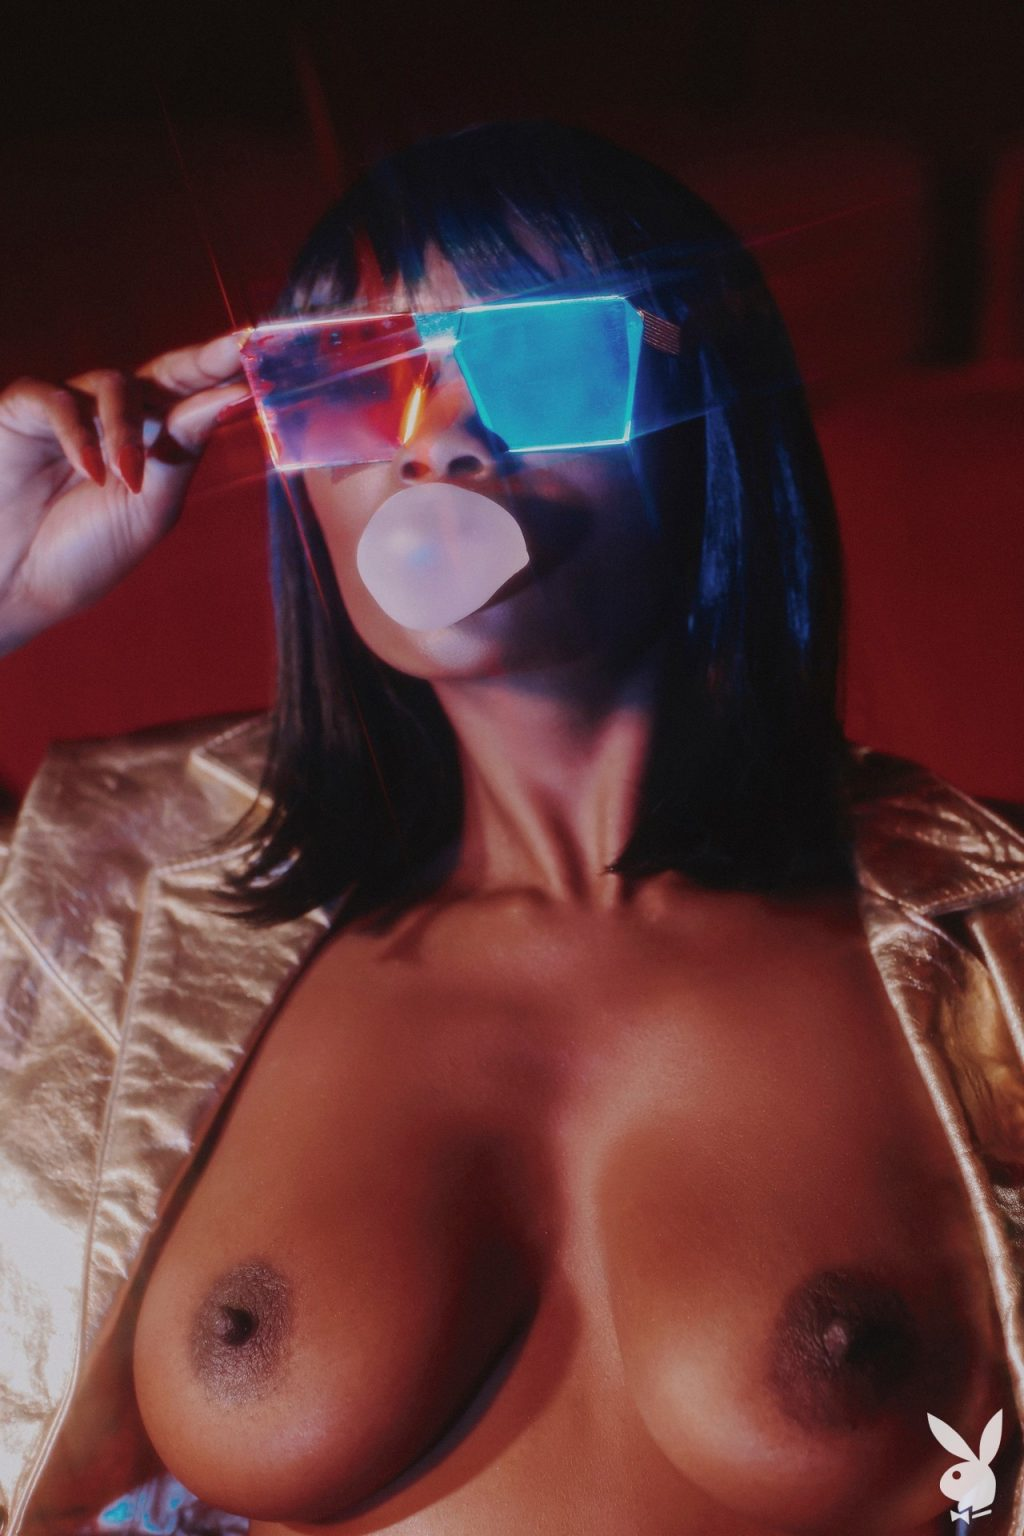 Chasity Samone Nude – Playmate February 2020 (53 Photos + GIFs & Video)